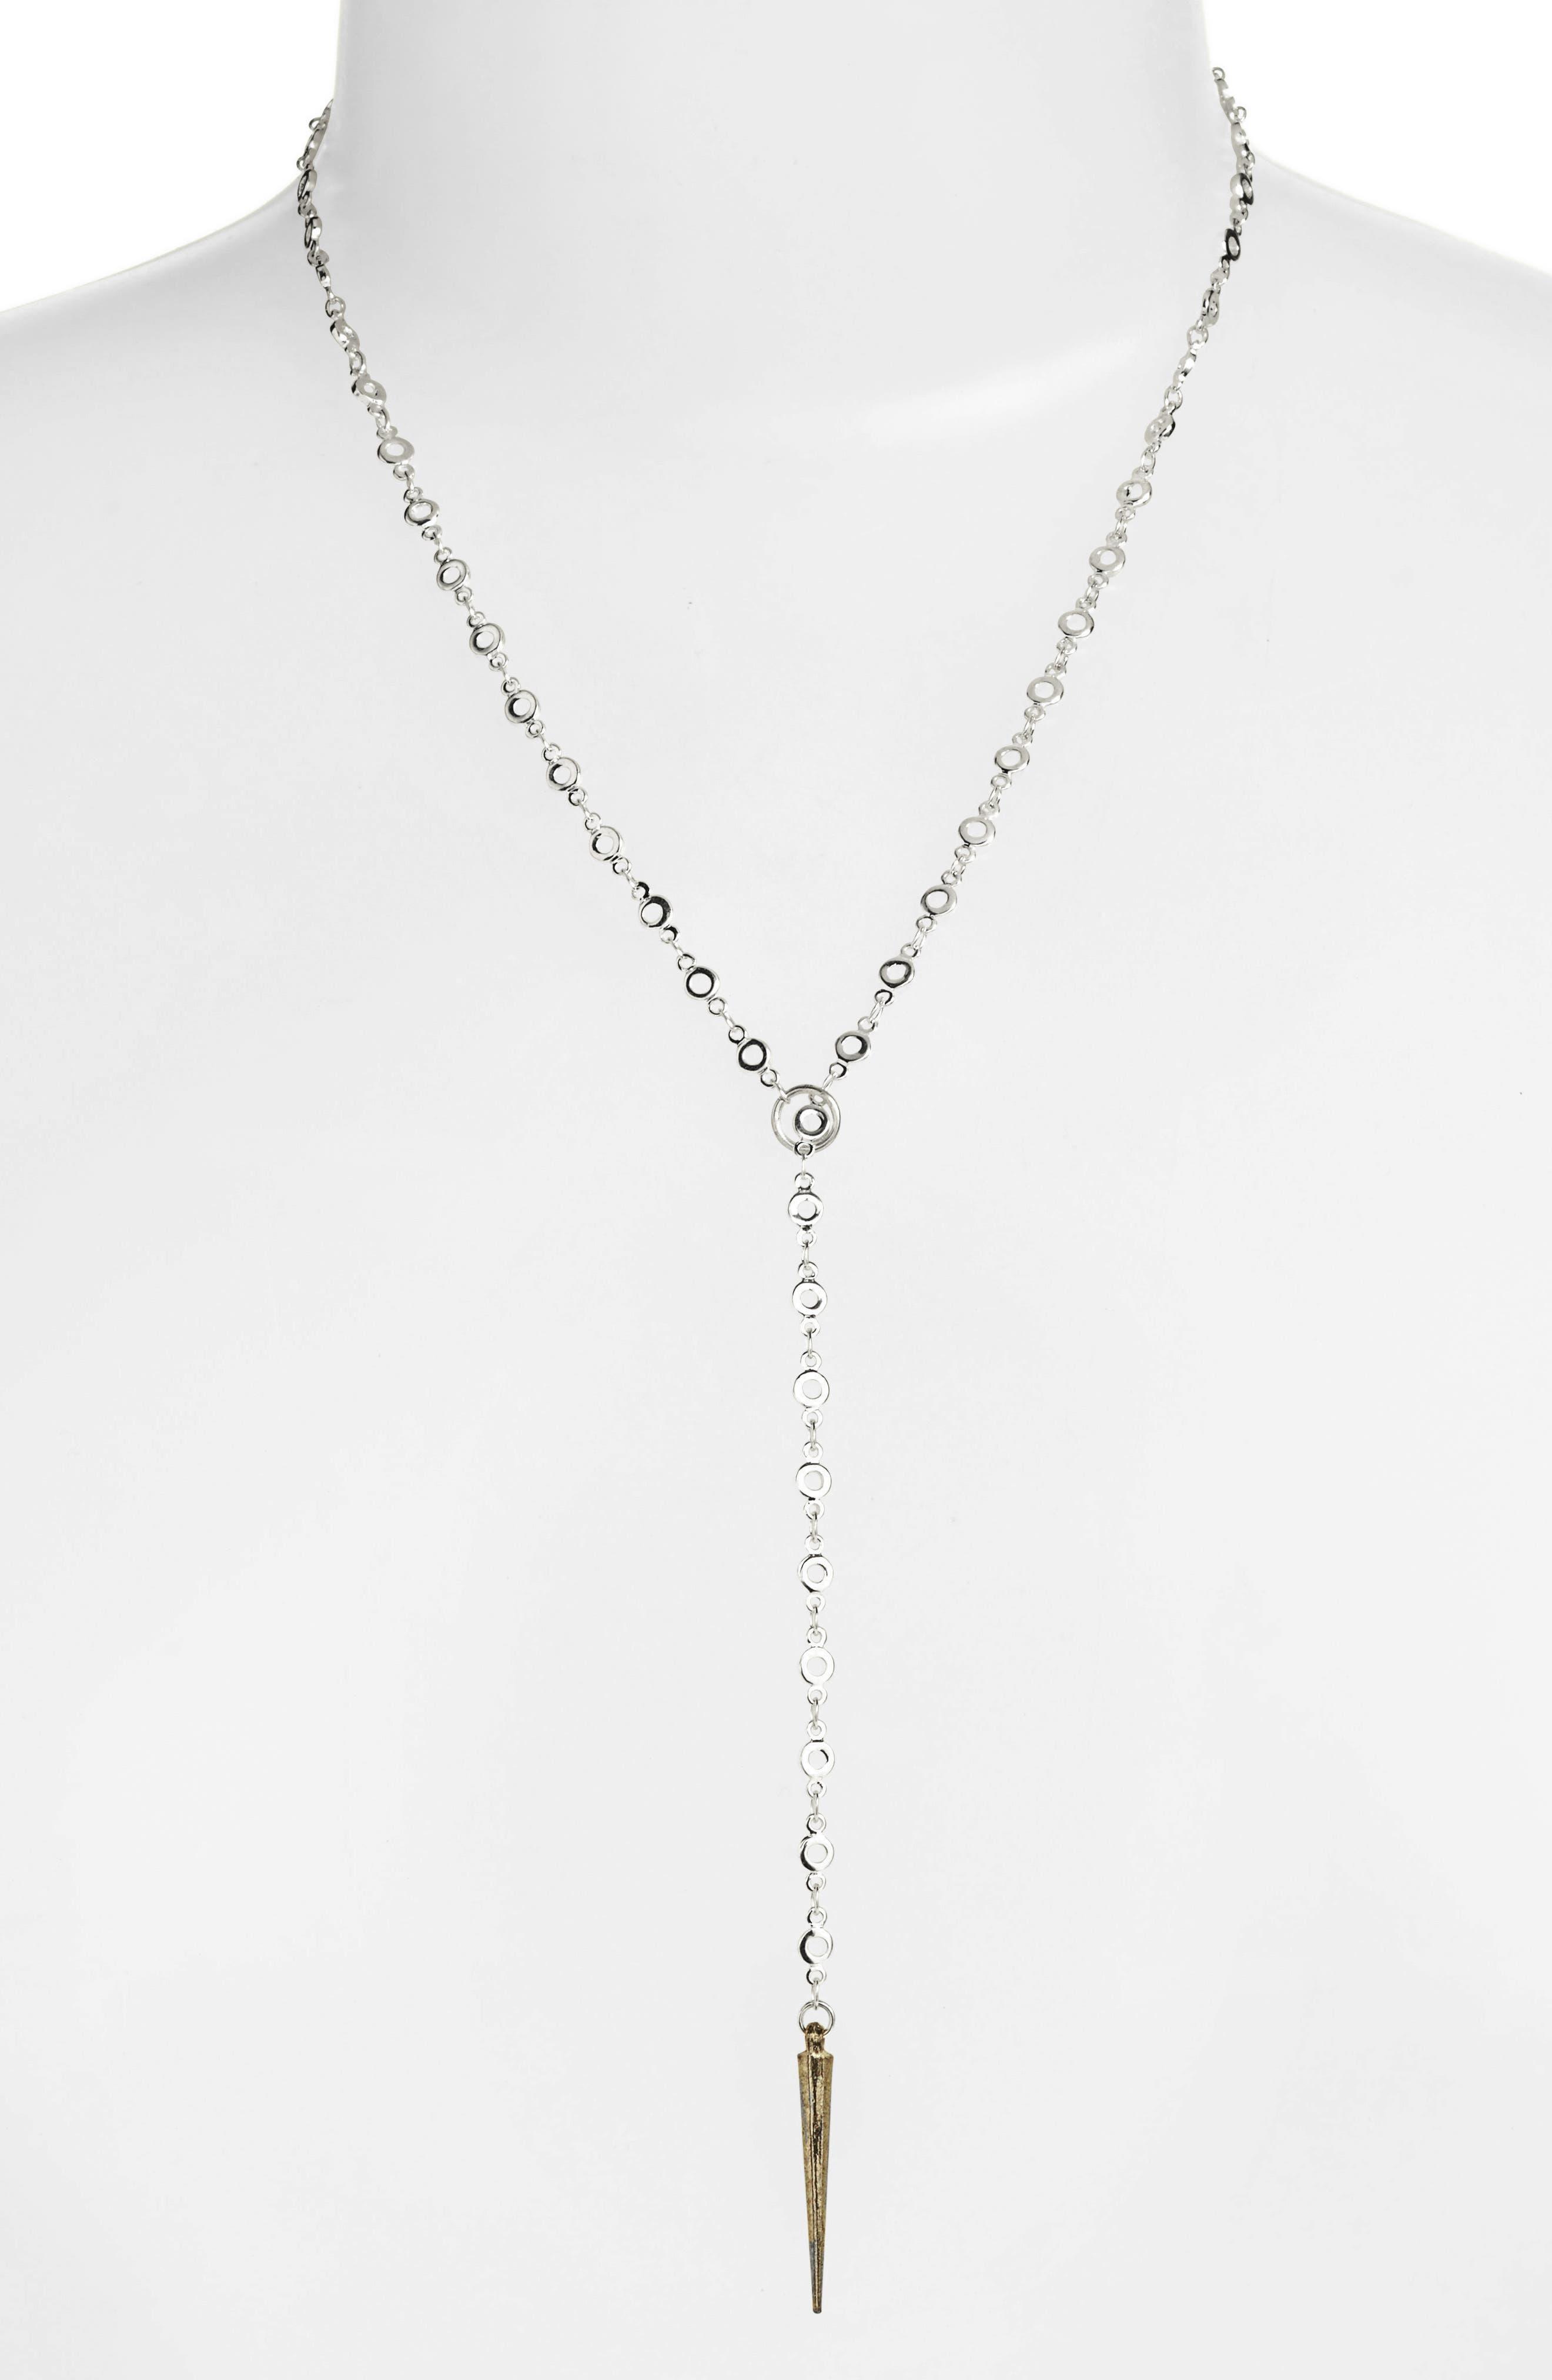 Main Image - Karen London Everyday Lariat Necklace